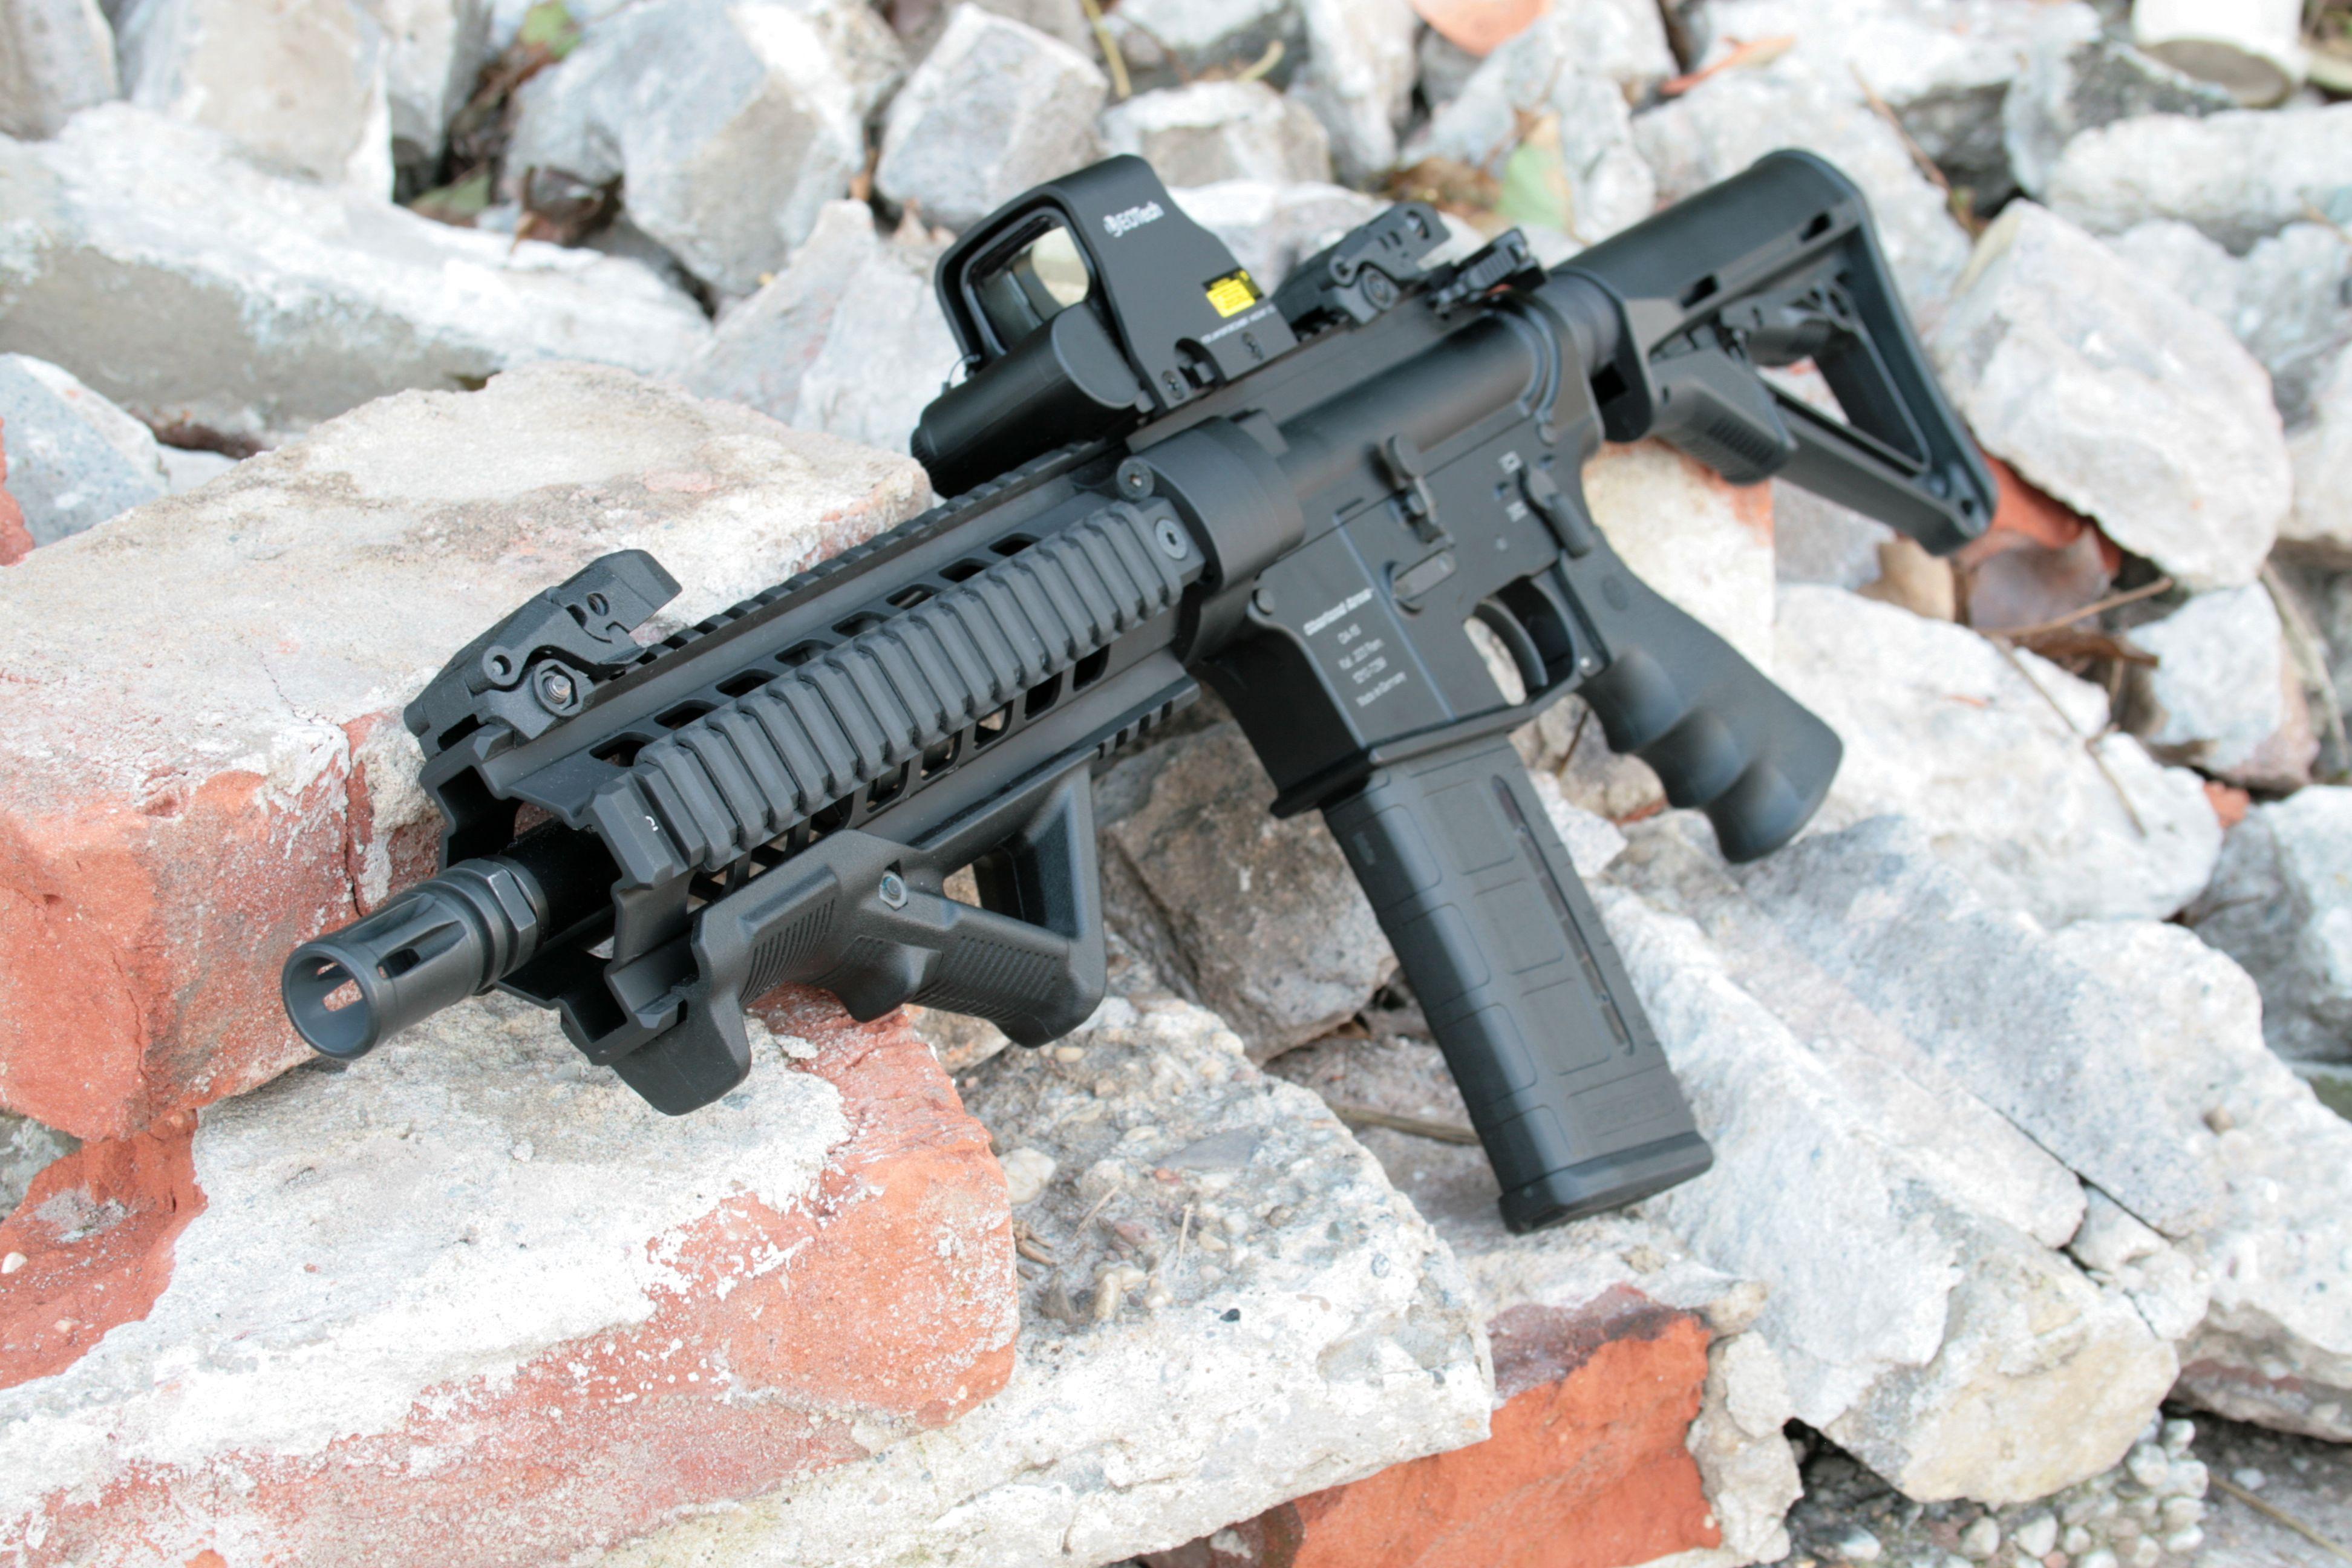 Colt AR 15 4k Ultra HD Wallpaper